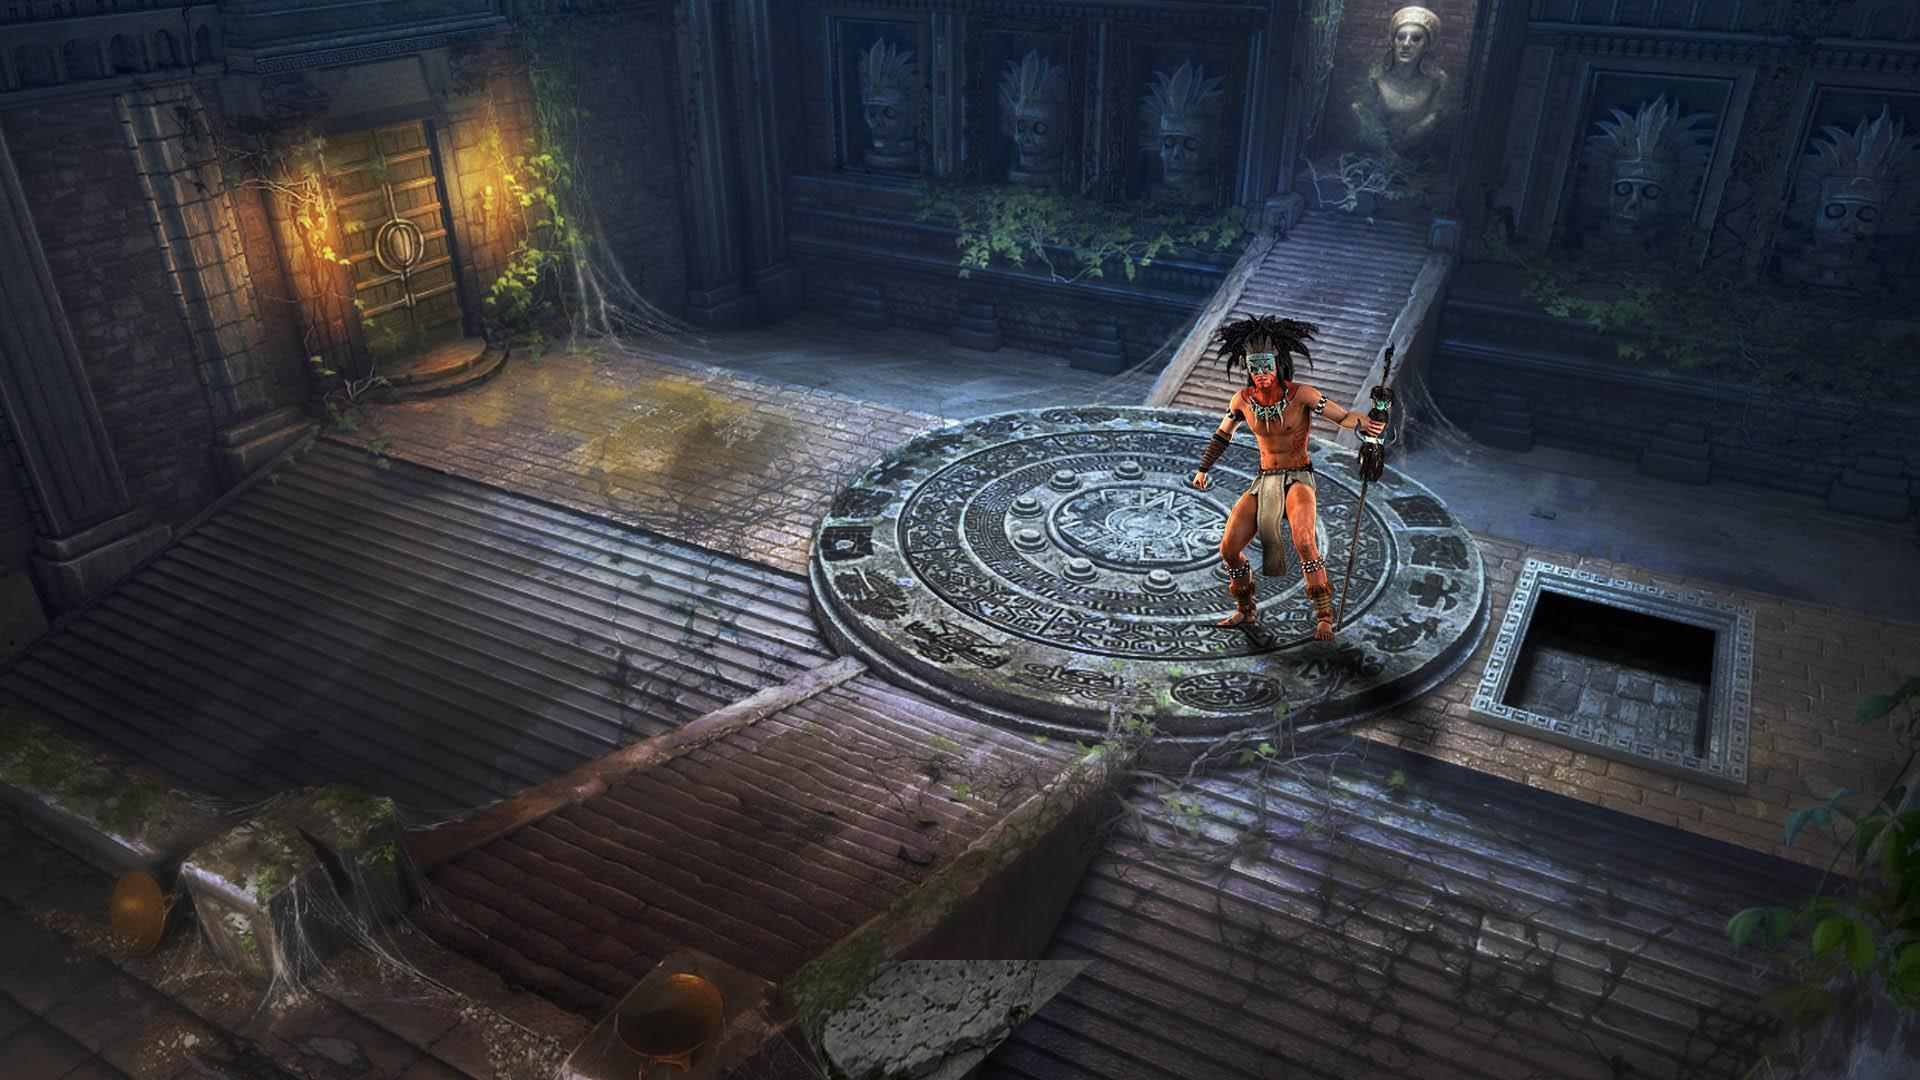 Steam card exchange showcase portal of evil stolen runes card 4 of 5artwork shaman malvernweather Images